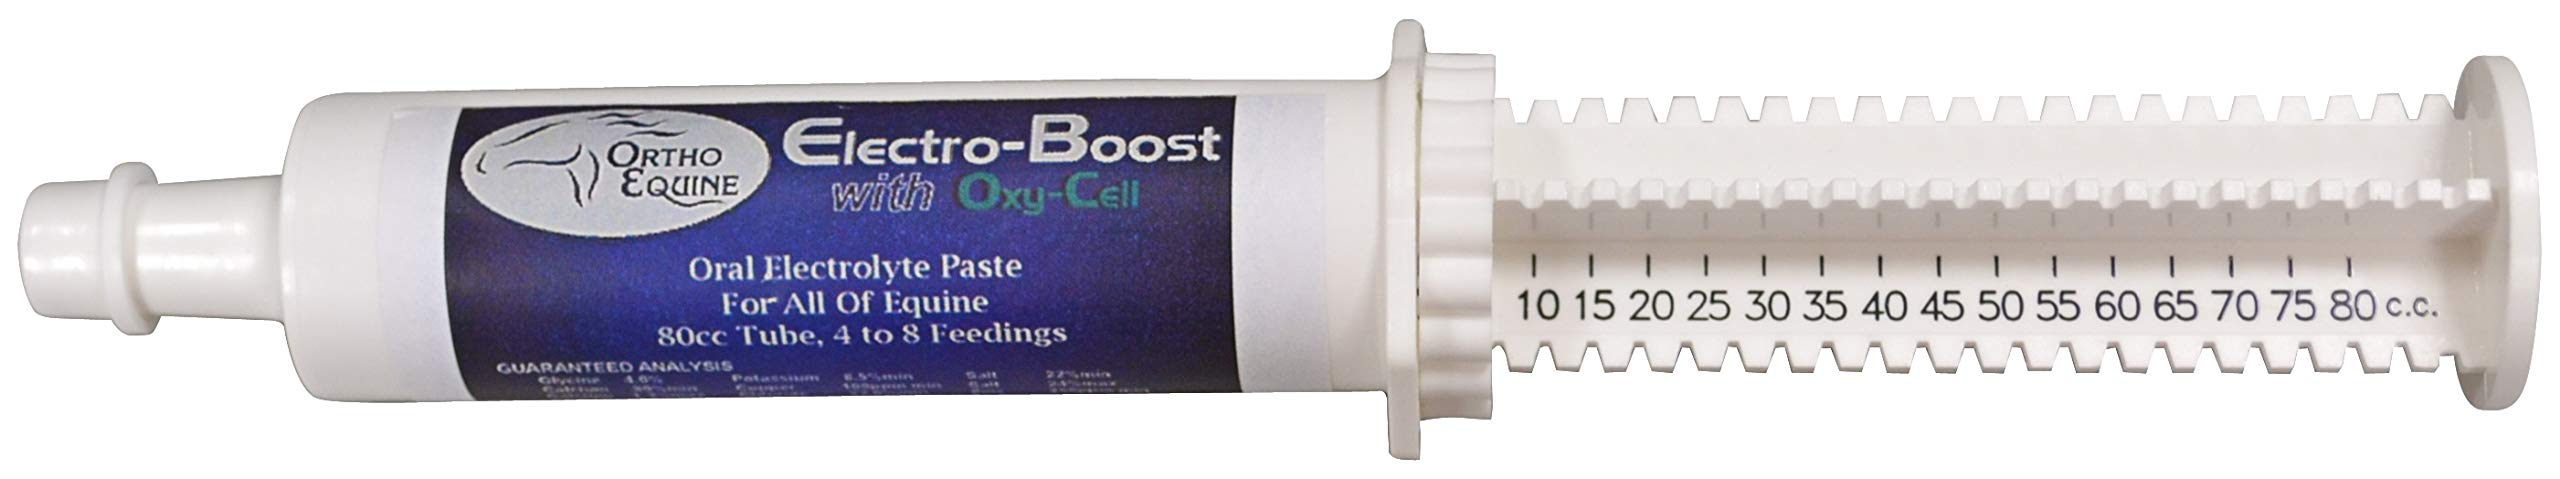 Durvet Electro-Boost Horse Paste, 80 CC Syringe by Durvet